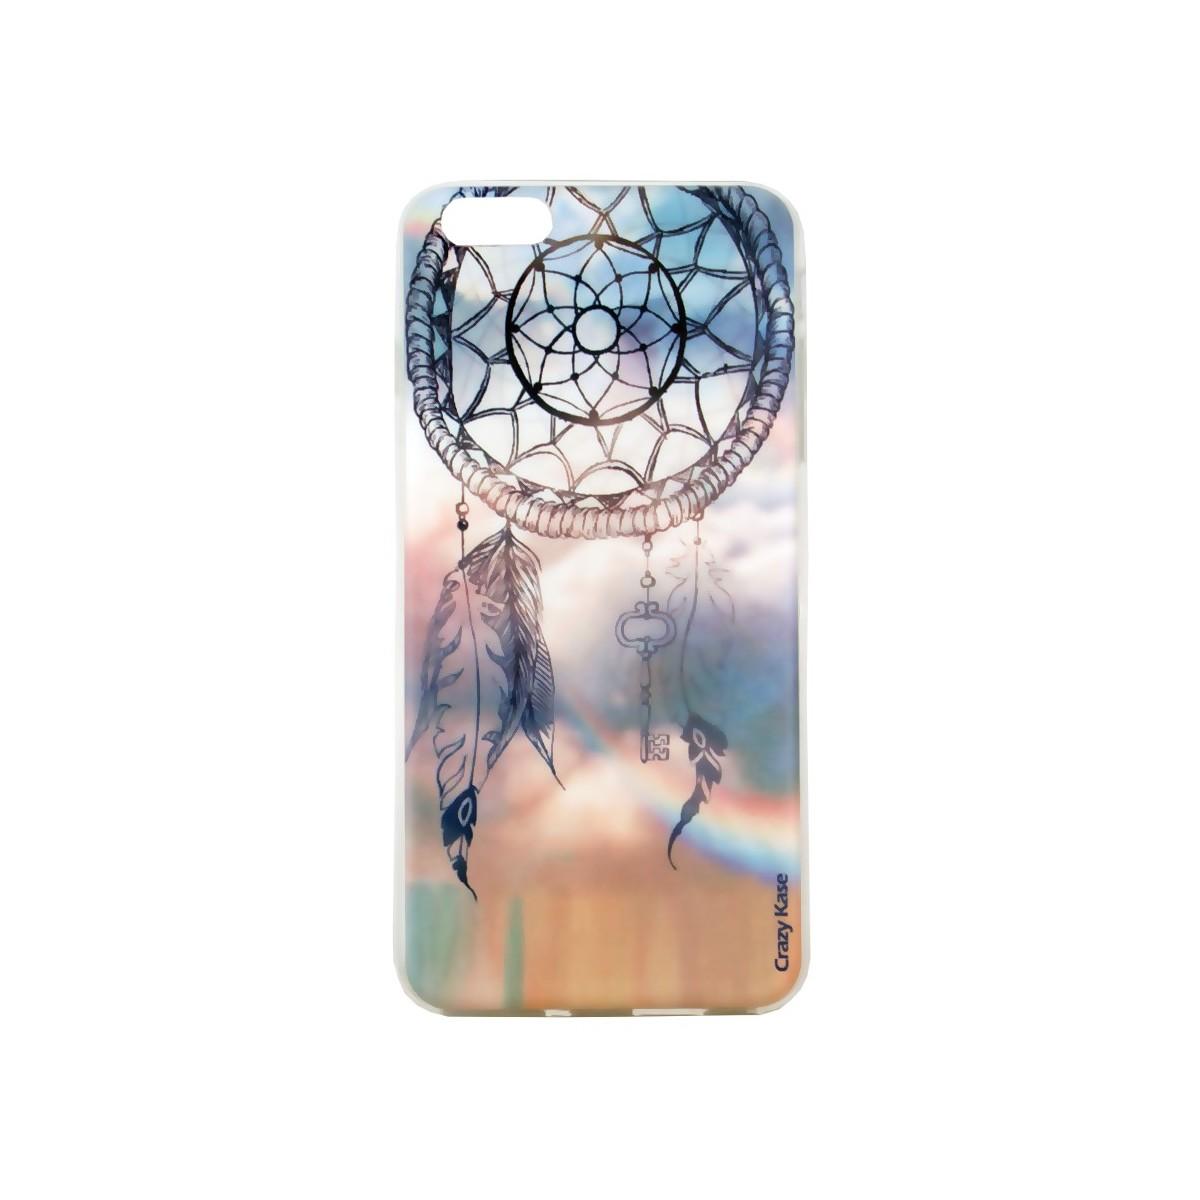 Coque iPhone 6 Plus motif Attrape Rêve